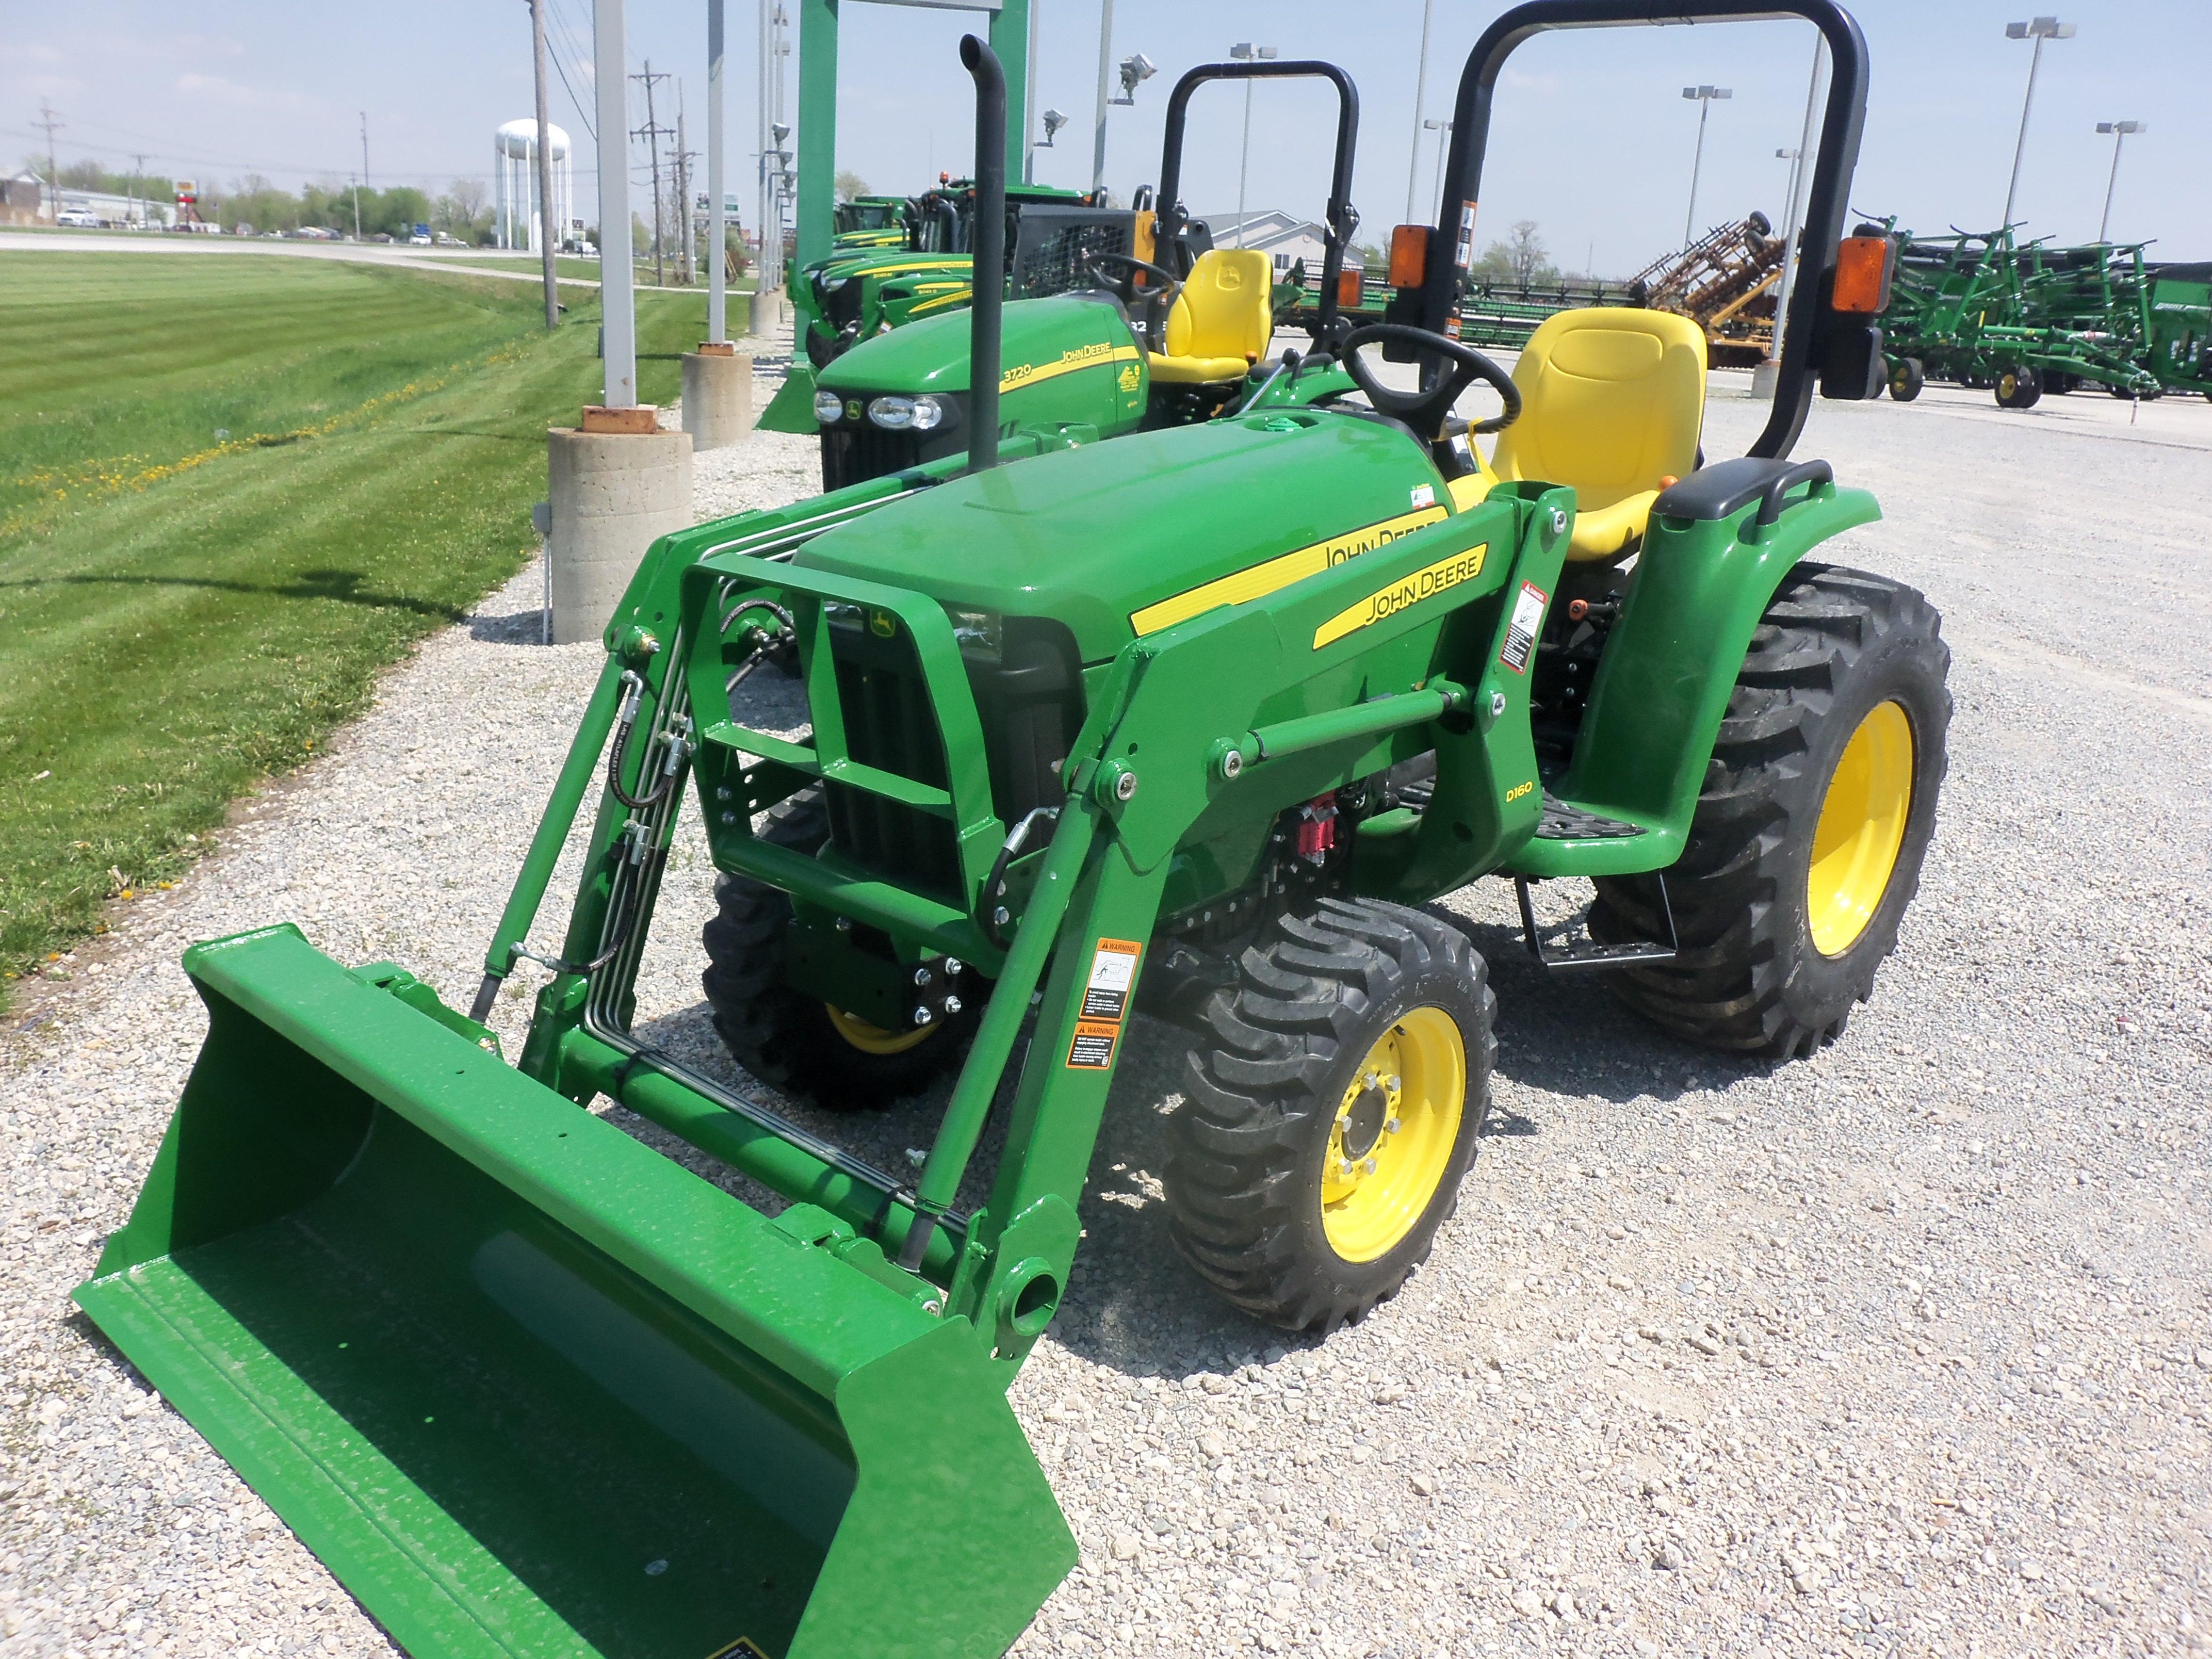 John Deere 3038E with D160 loader | John Deere equipment ...